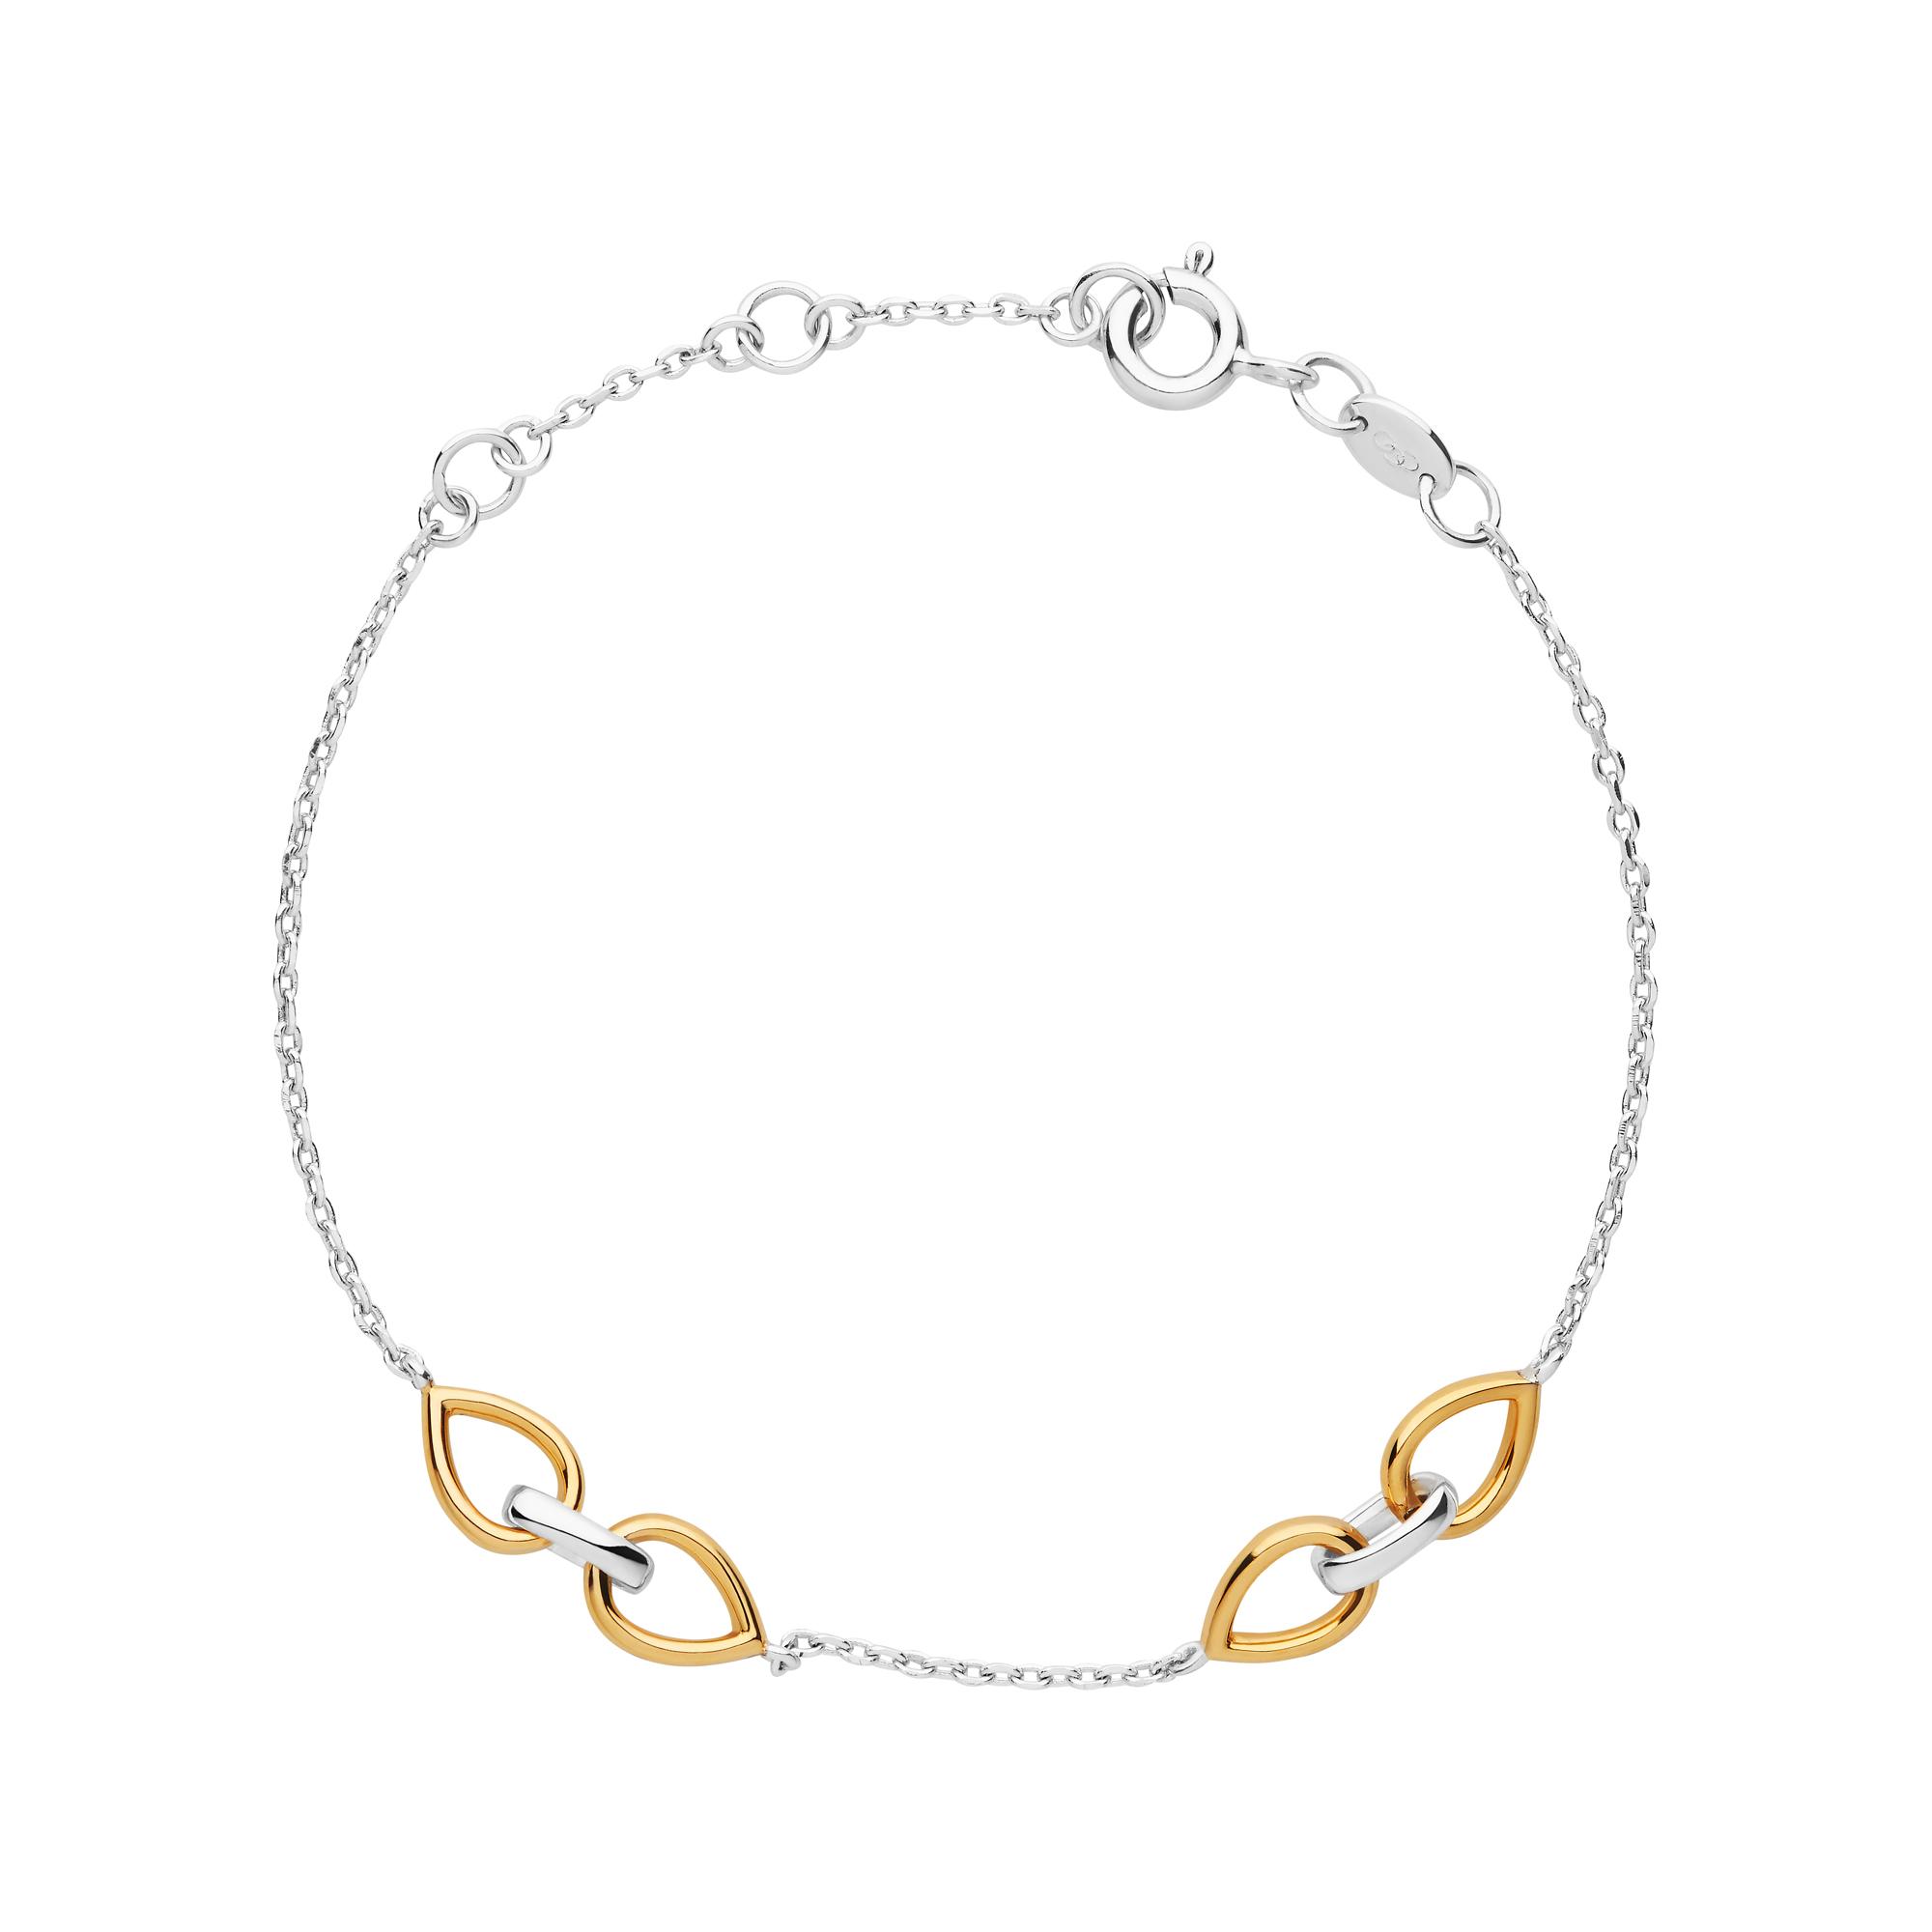 LINKS OF LONDON - Ασημένιο βραχιόλι Outlet Flare γυναικεία αξεσουάρ κοσμήματα βραχιόλια